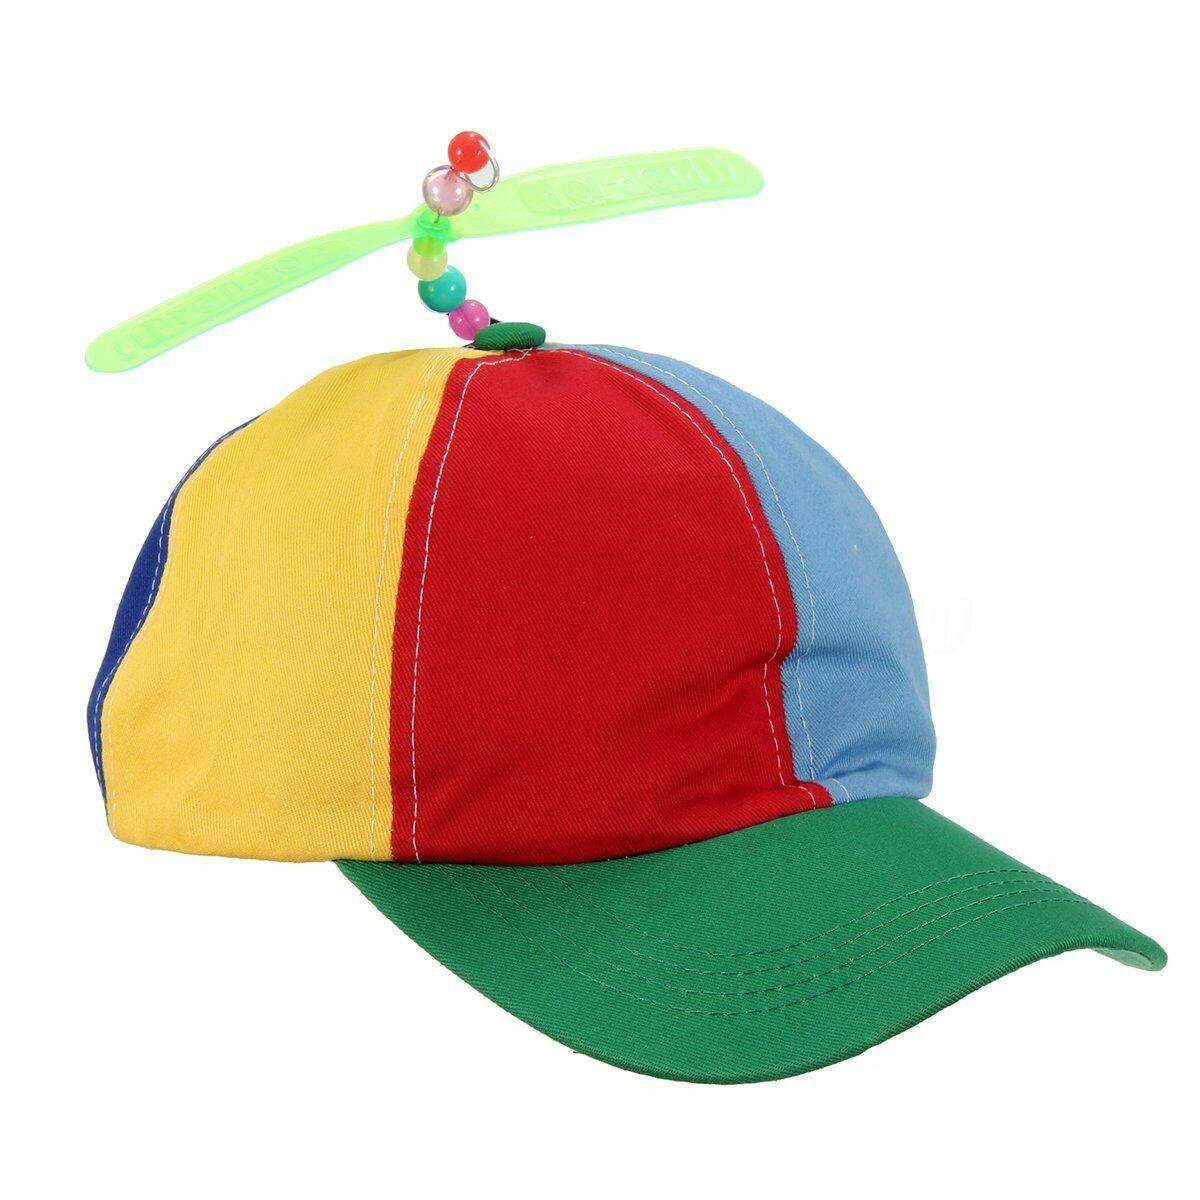 Propeller Hat Helicopter Cap Clown Jester Tweedle Dee Costume Colorful